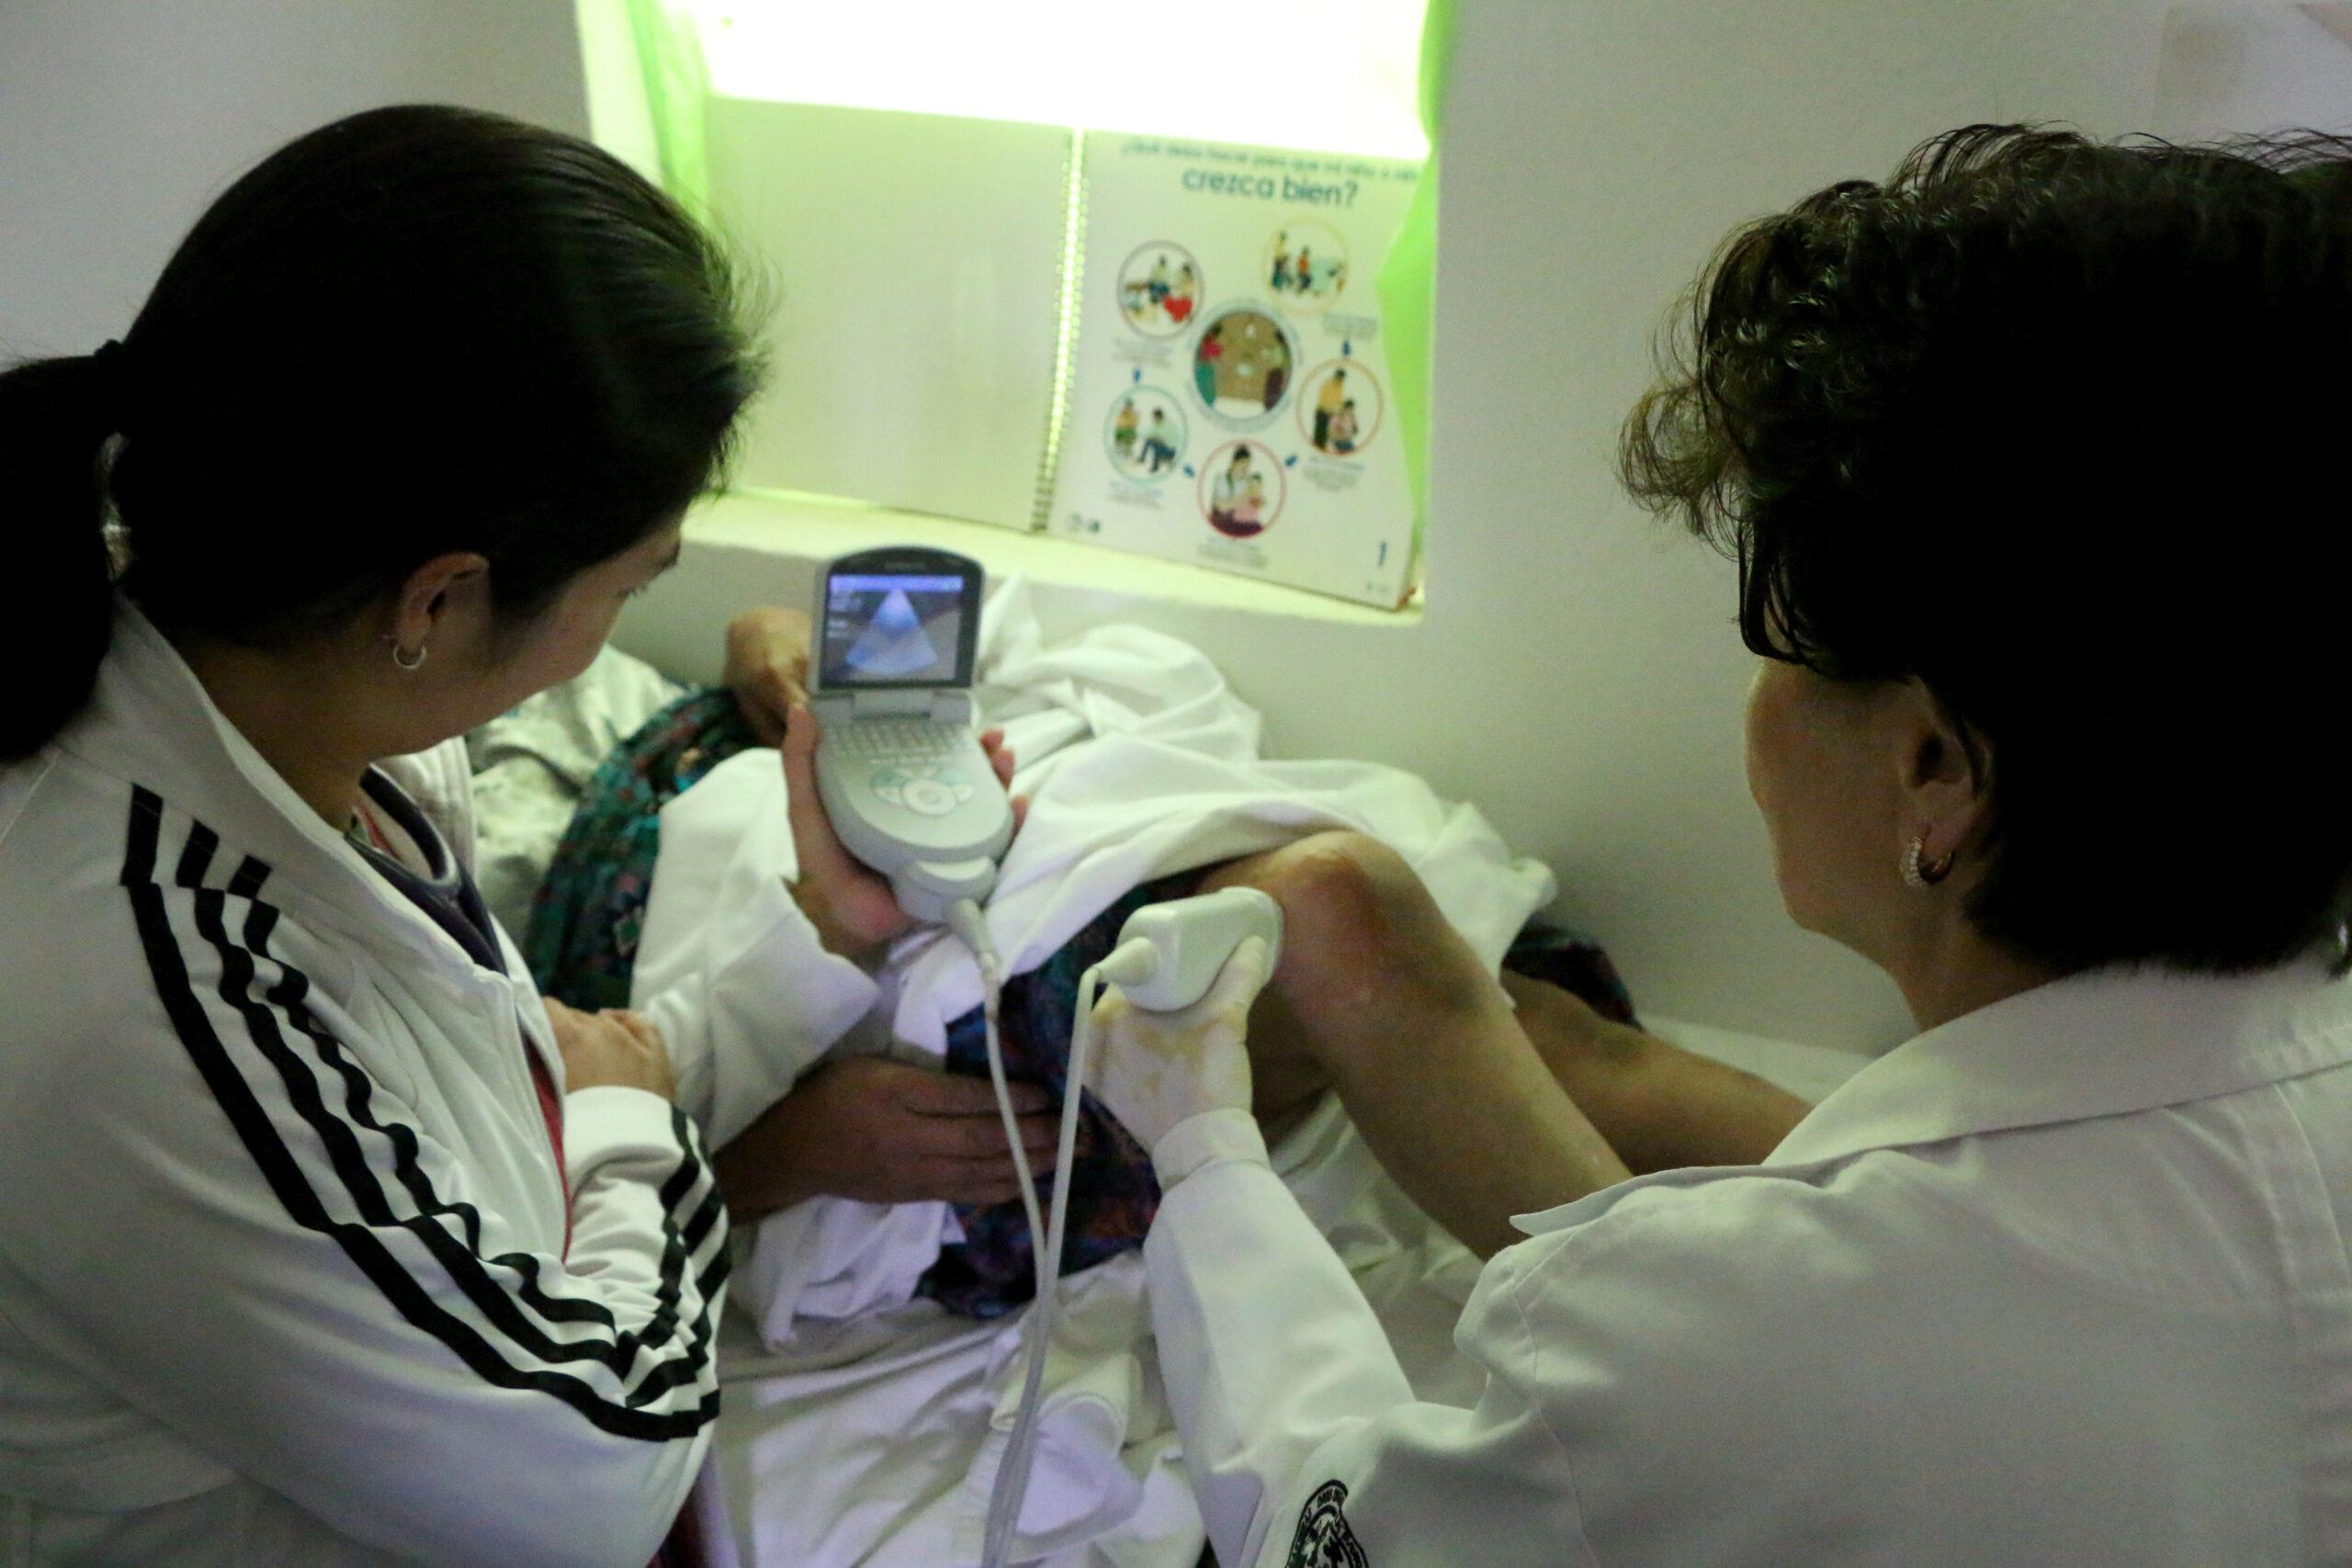 Guatemala, Chocruz, Ärztin, Ultraschall